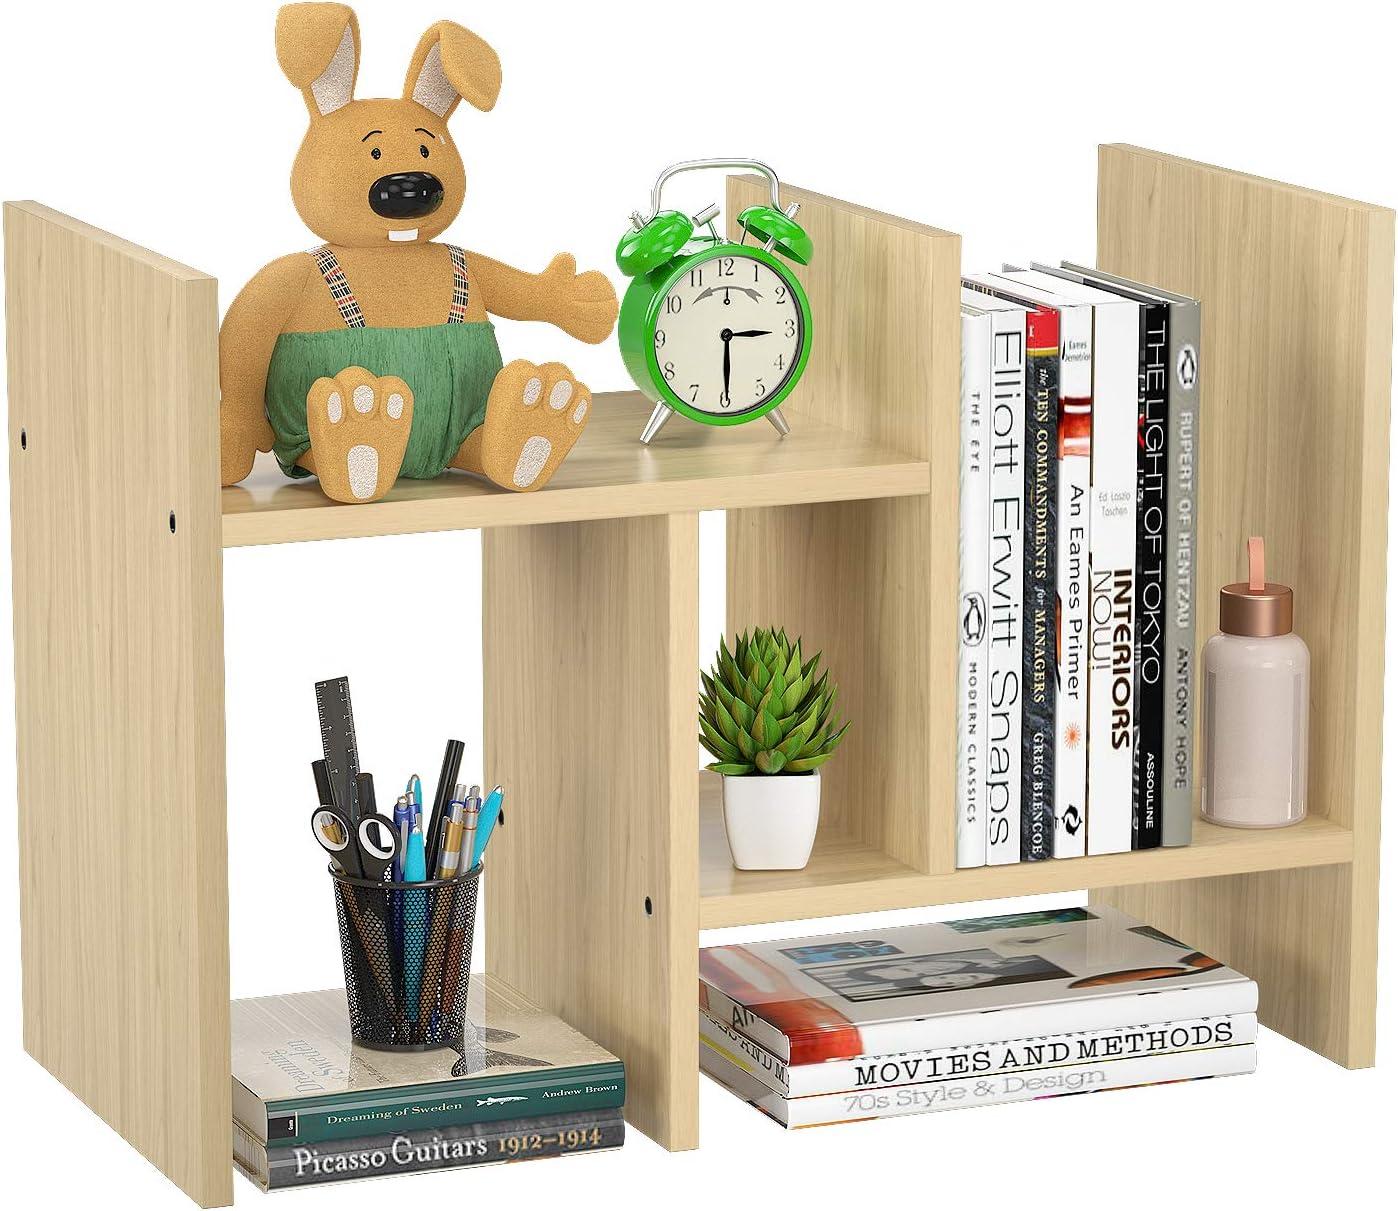 FoxEmart Desktop Shelf Organizer, Adjustable Wood Display Desk Shelf, Countertop Storage Rack Tabletop Bookshelf Multipurpose Shelves for Home Decor, Office, Kitchen, Bathroom - Natural